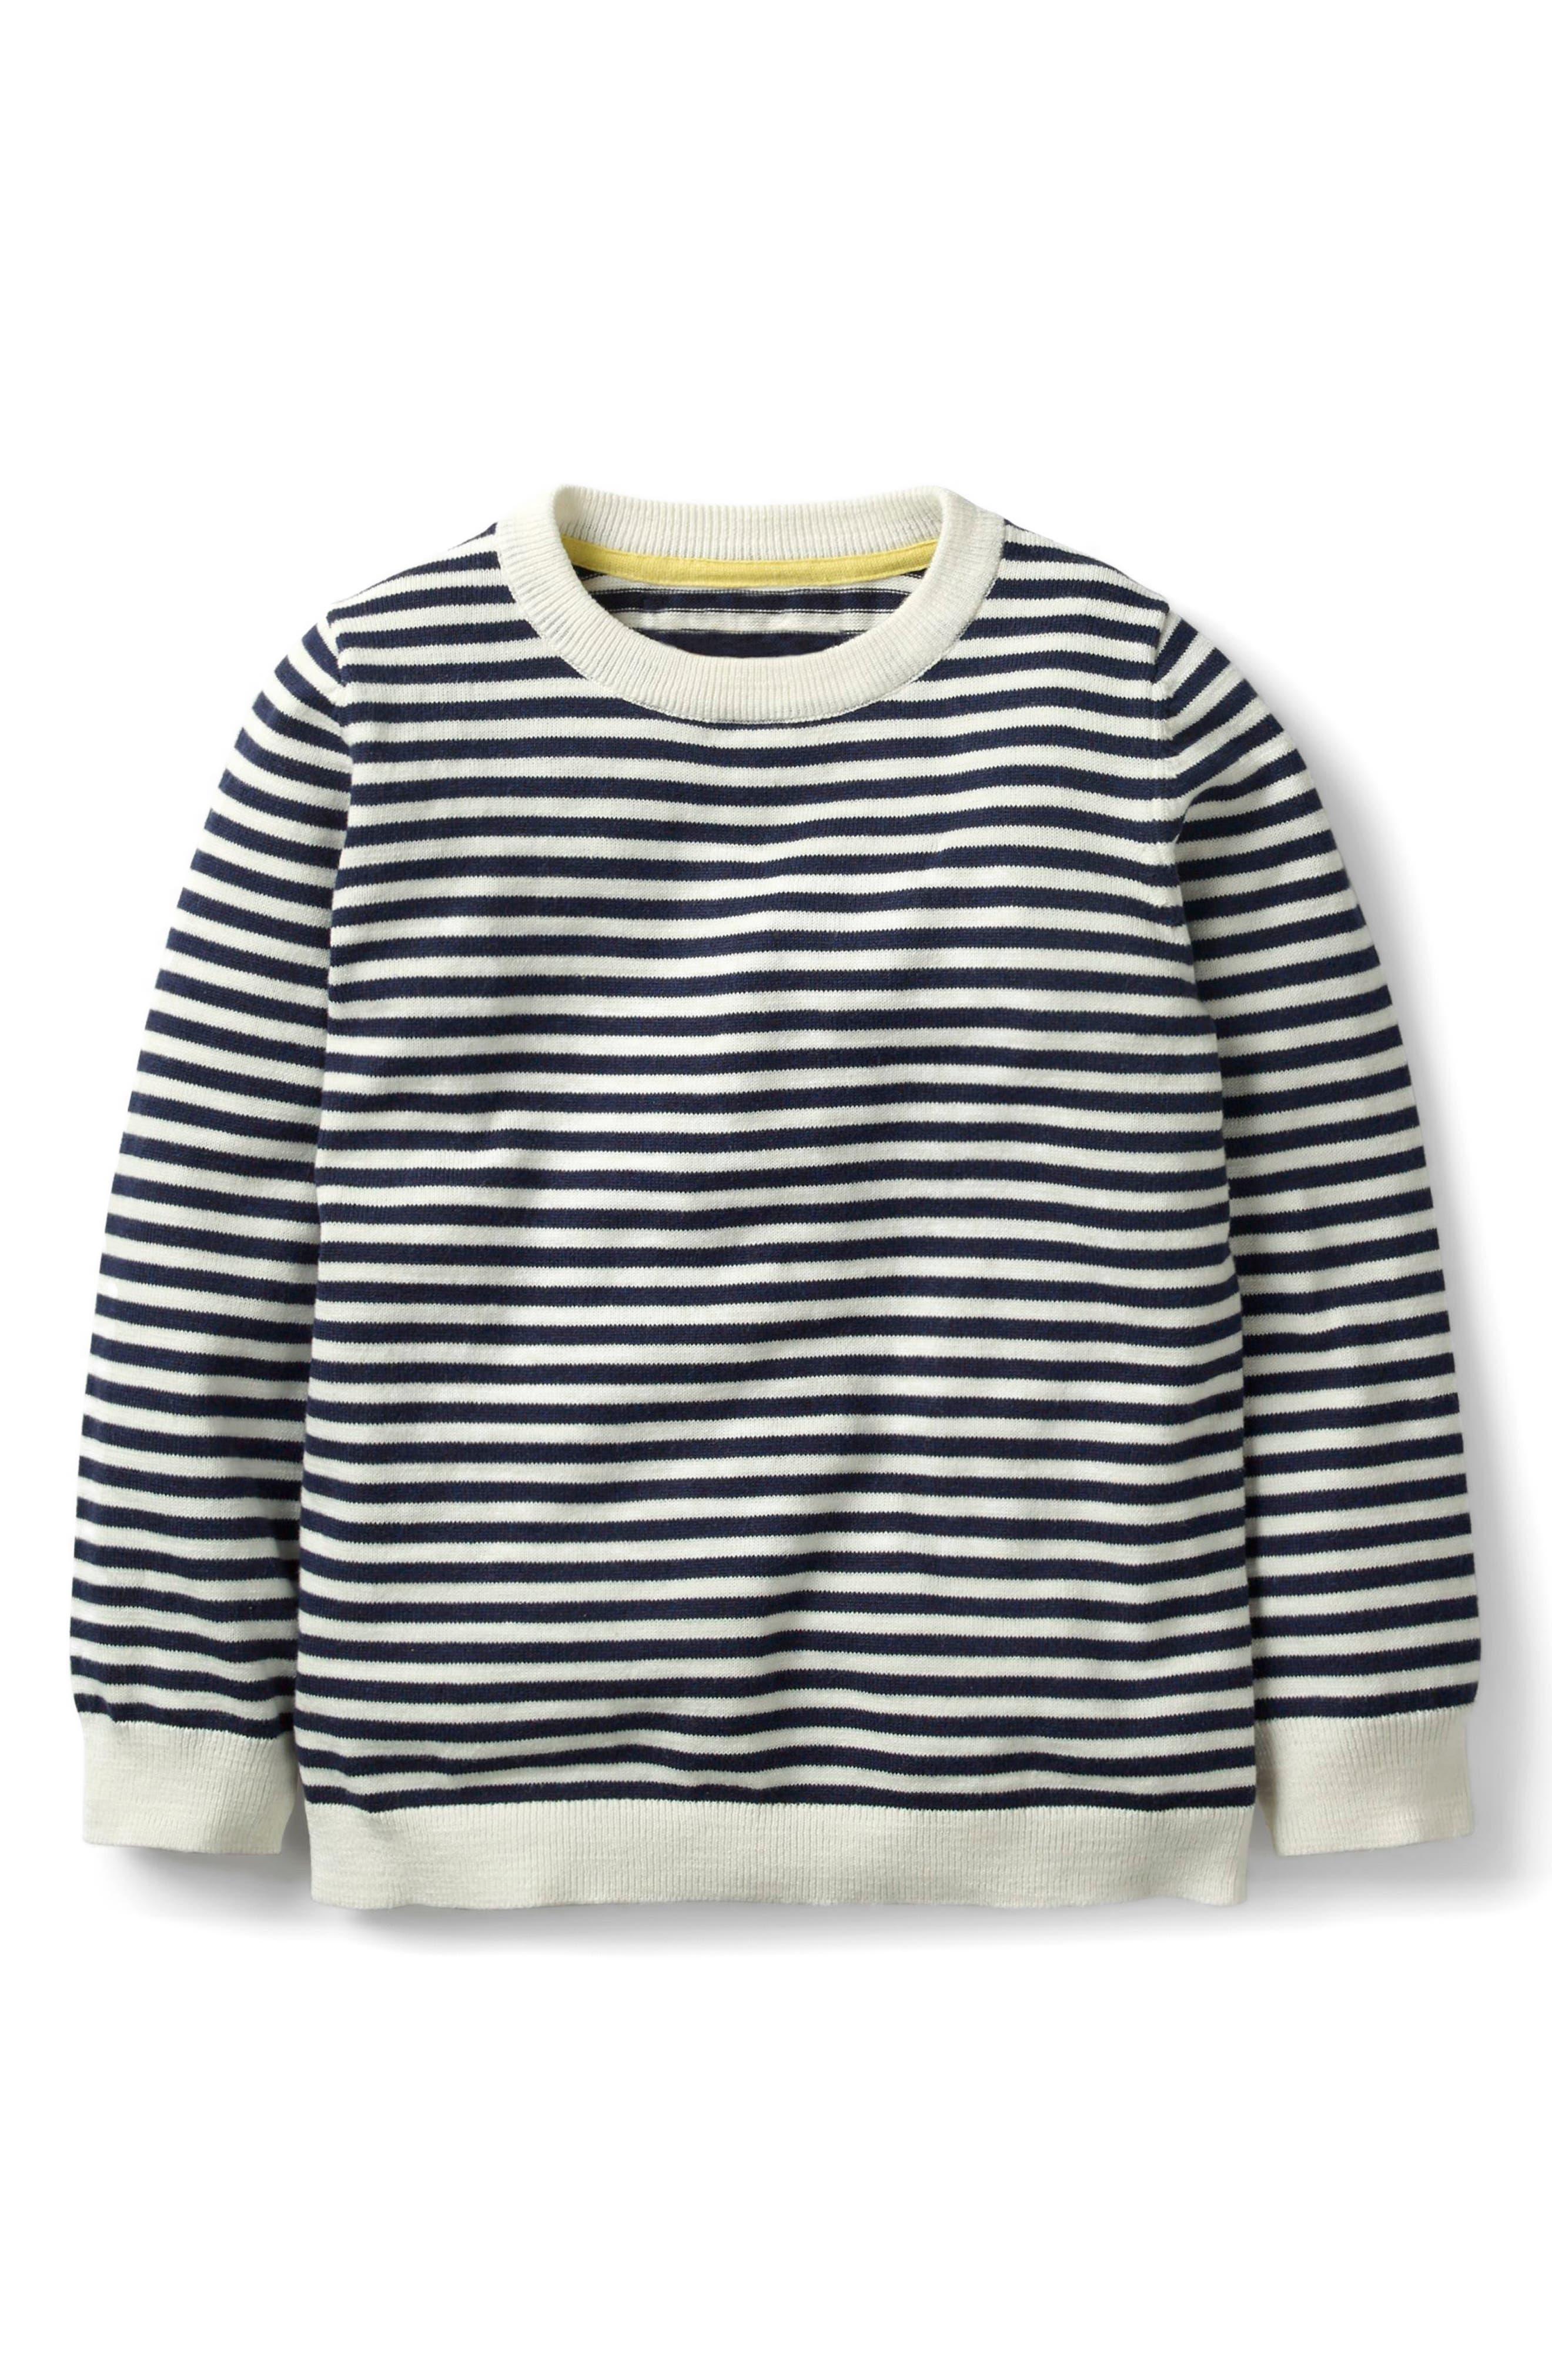 Cotton & Cashmere Sweater,                         Main,                         color, 414